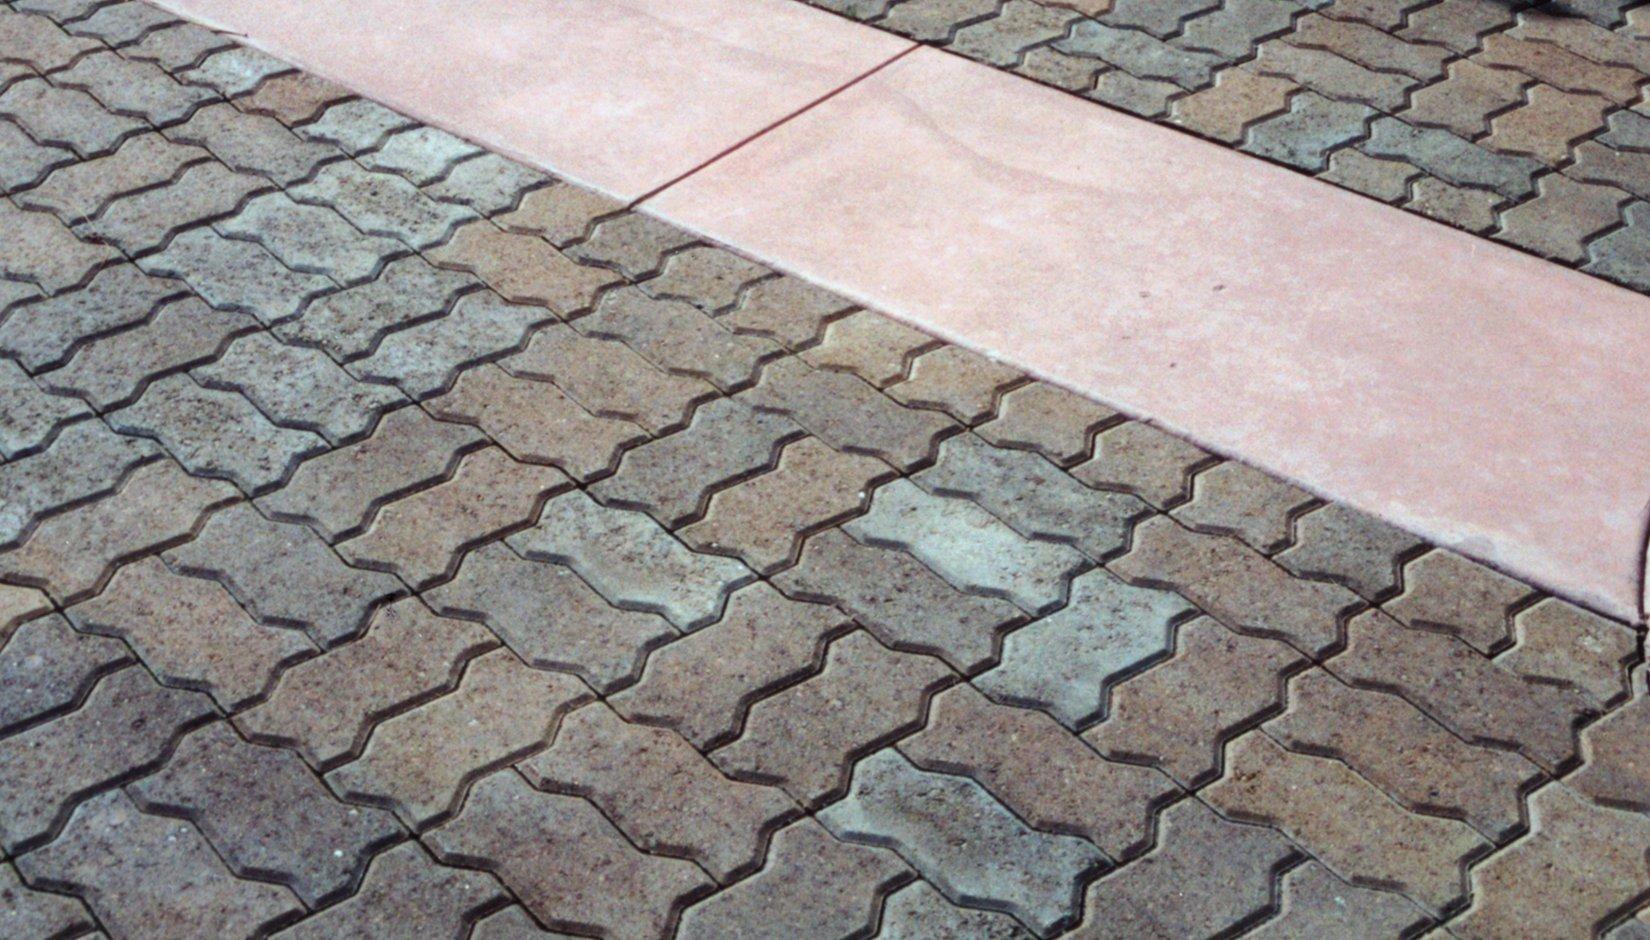 Pacific Interlock Paving Stone : Hydro flo™ universal pavers pacific interlock pavingstone